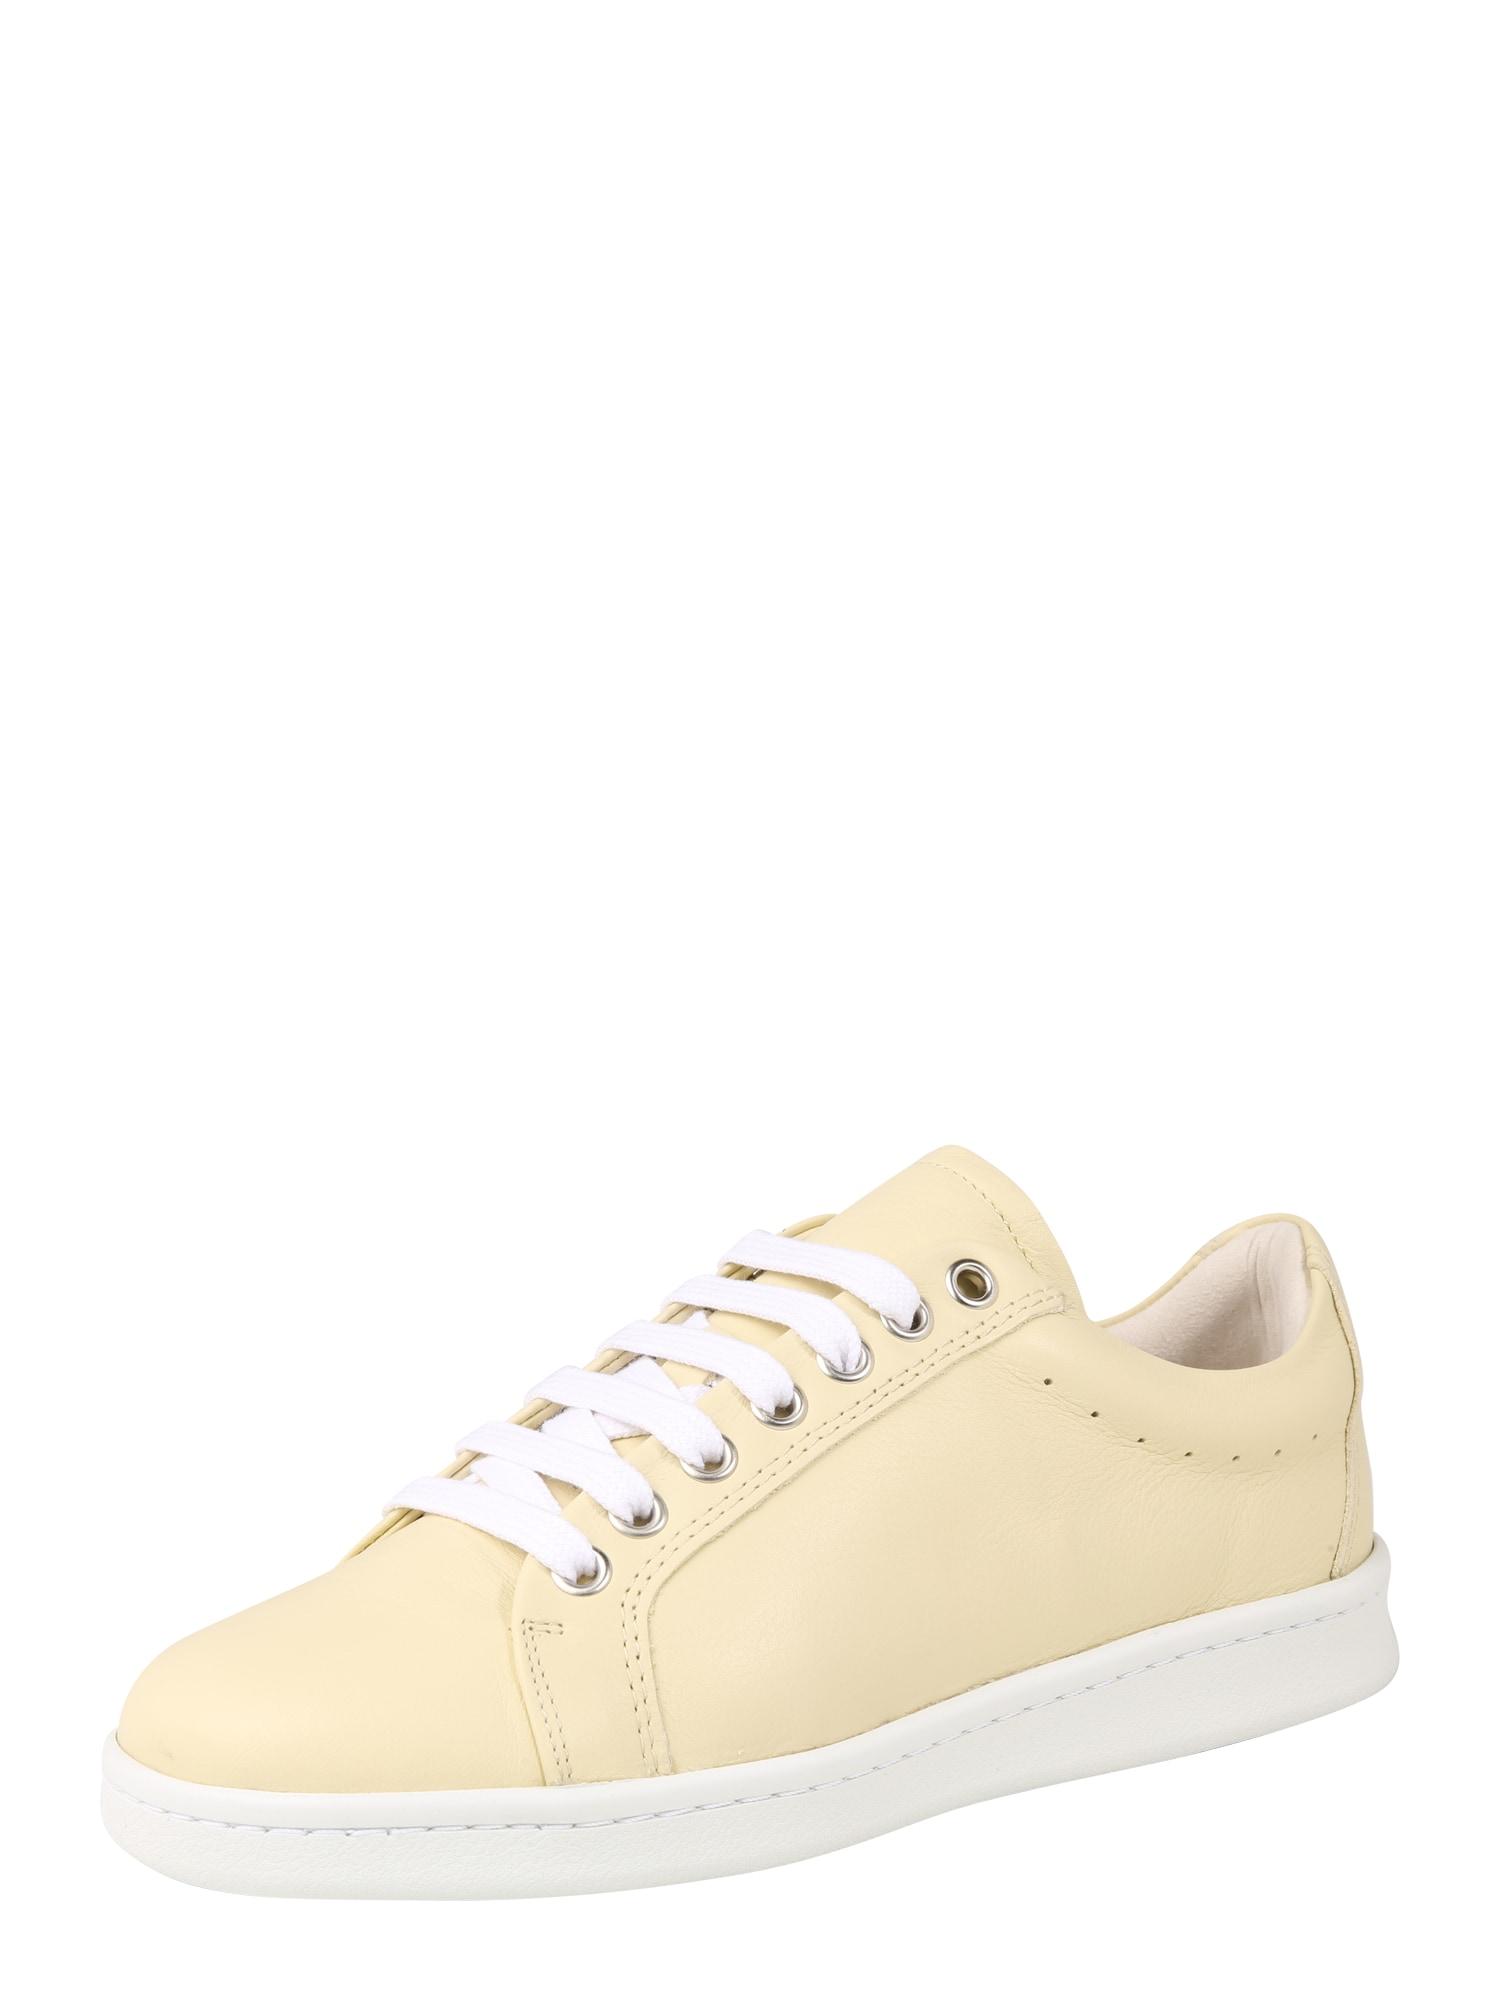 Tenisky Alice Sneaker béžová offwhite Filippa K